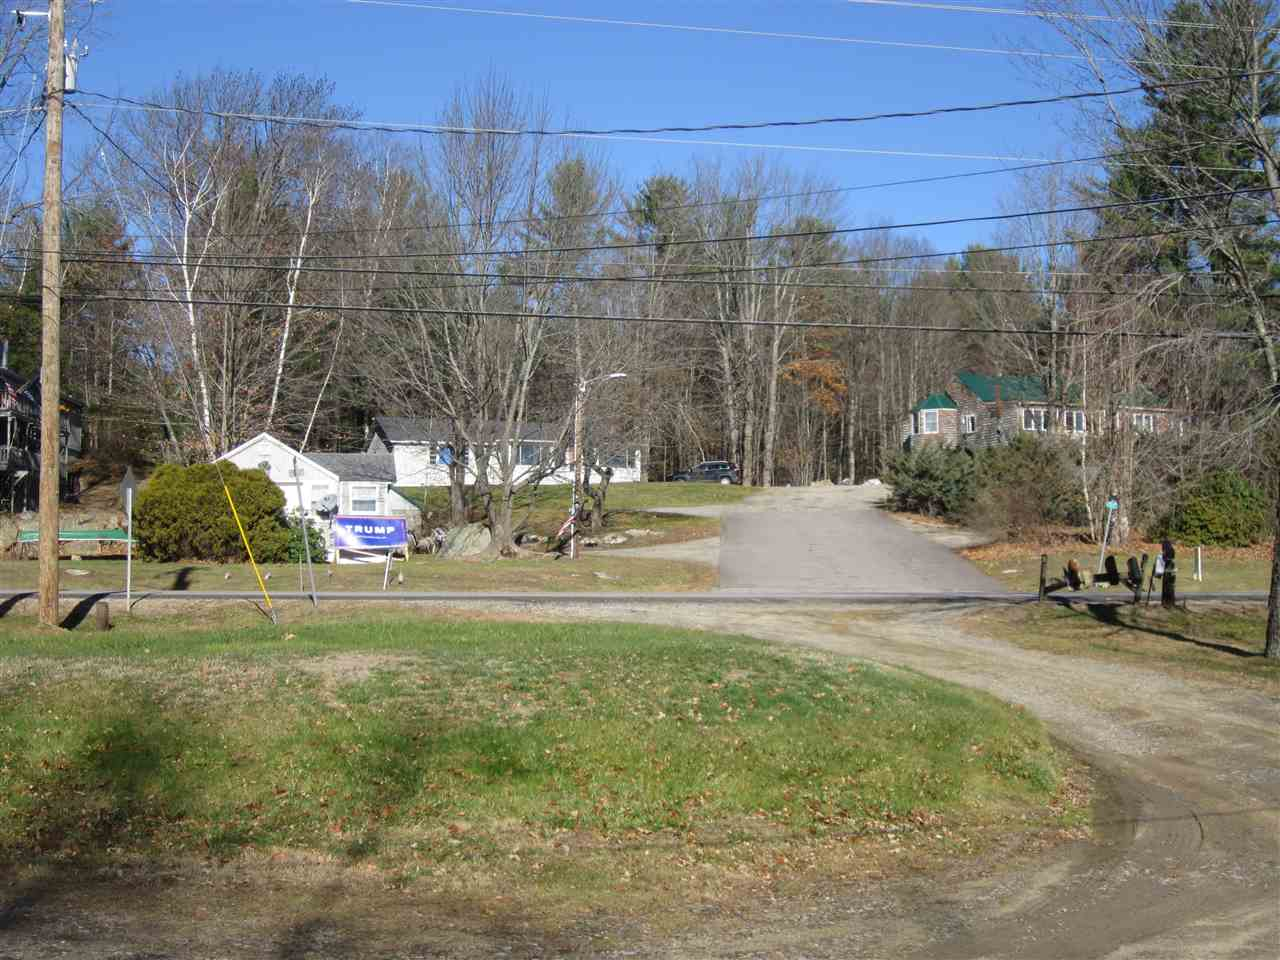 NEW HAMPTON NHMulti Family Homes for sale